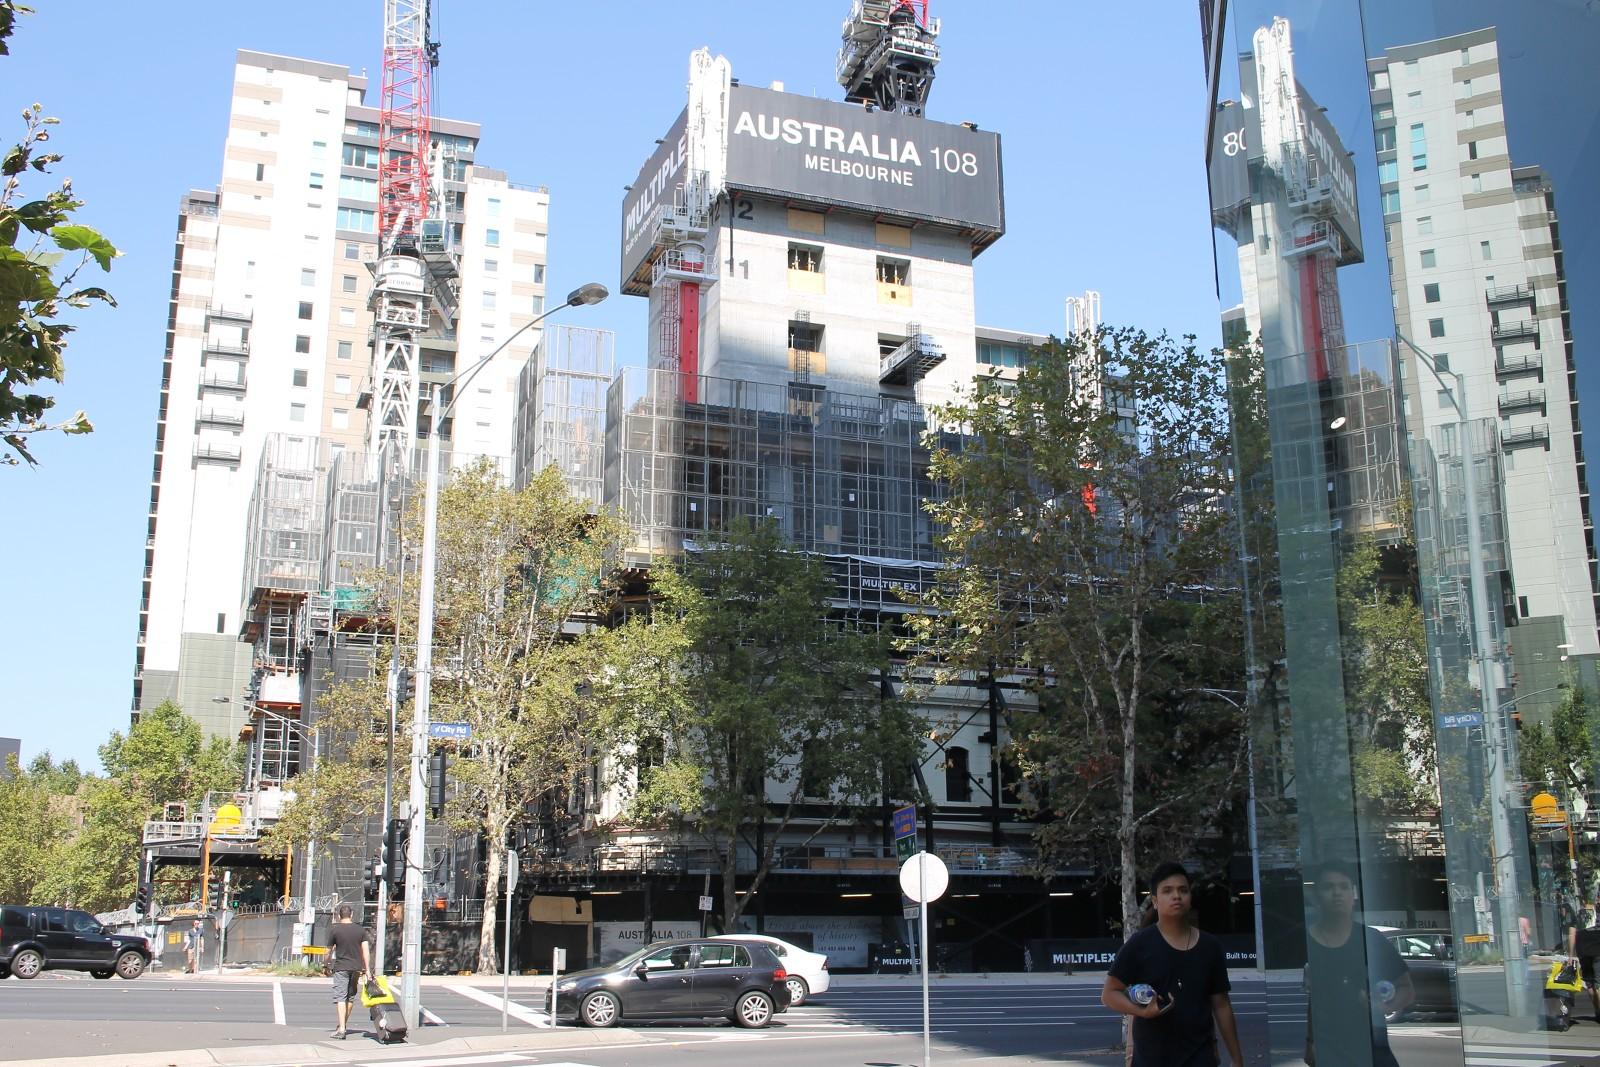 SOUTHBANK   Australia 108   70 Southbank Blvd   319m   Mixed Use